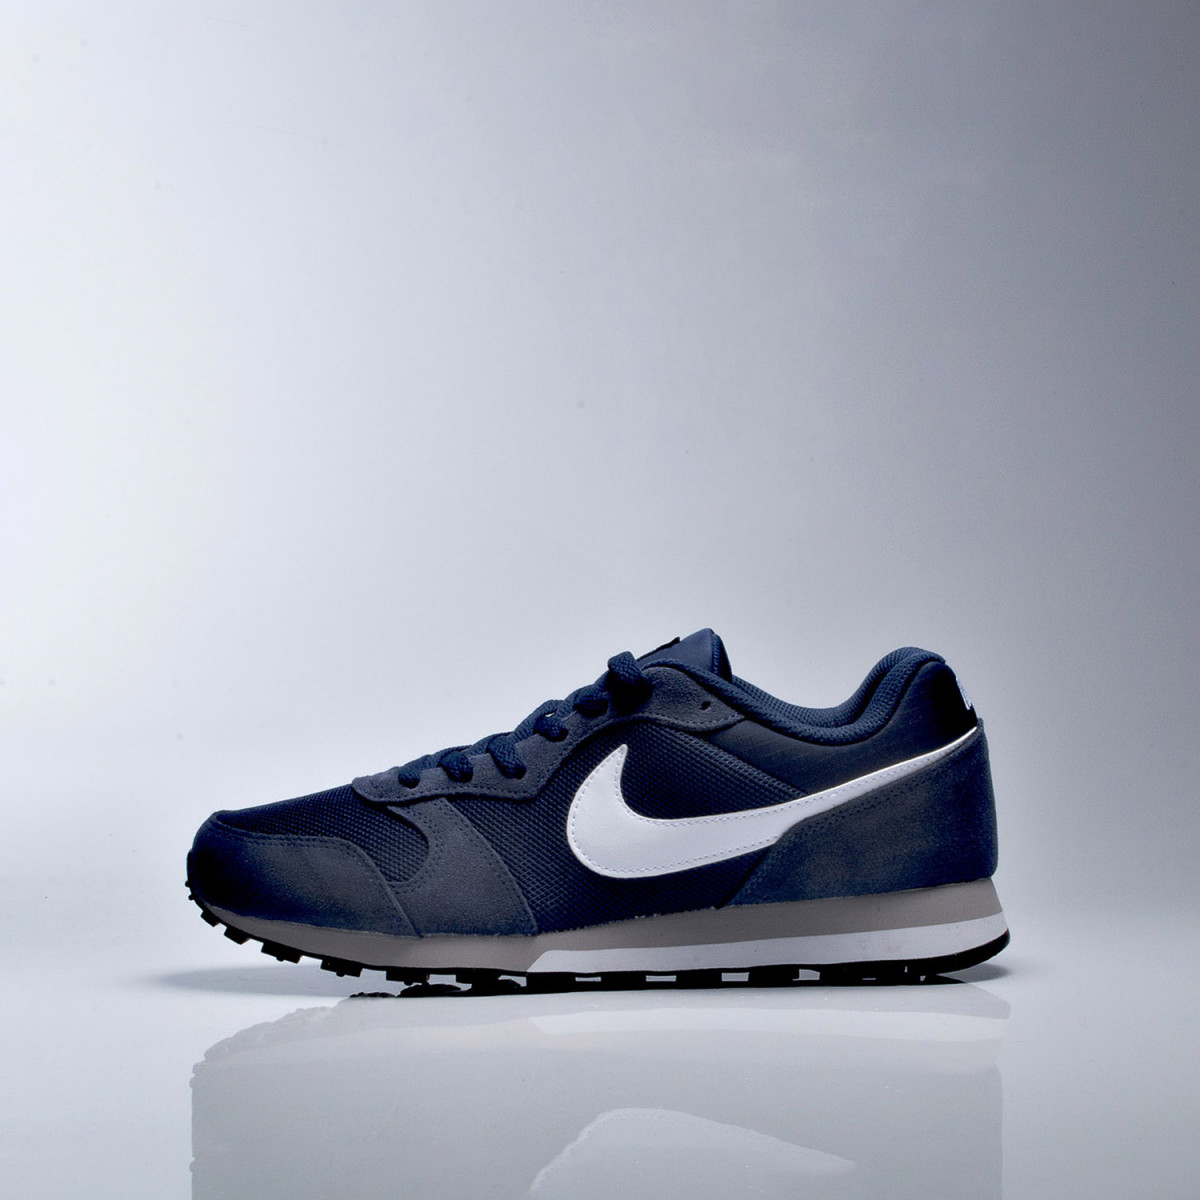 673906fdb5a Zapatillas Nike Md Runner 2 - Hombre